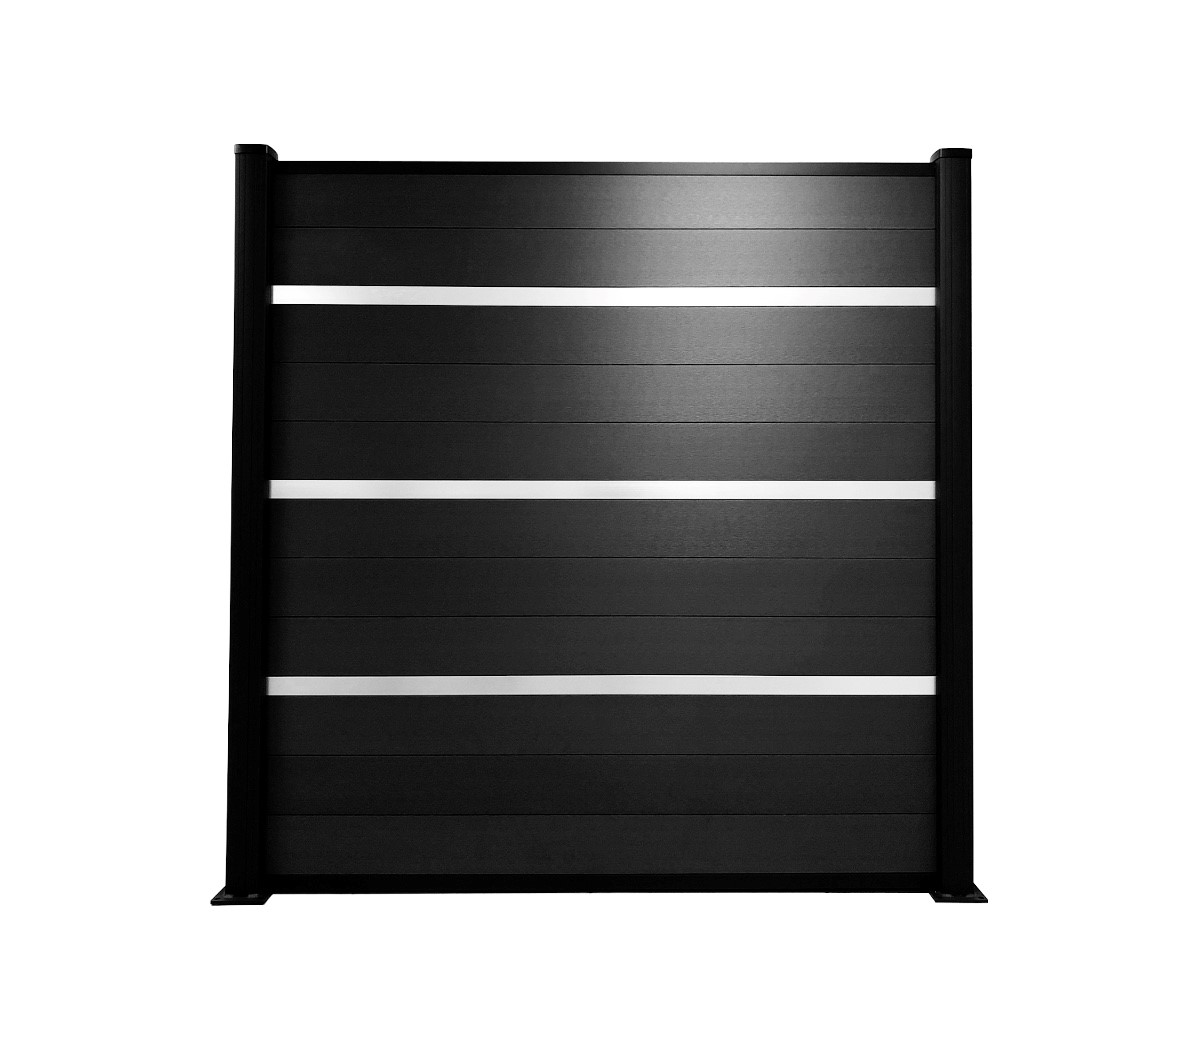 svart plank i komposit